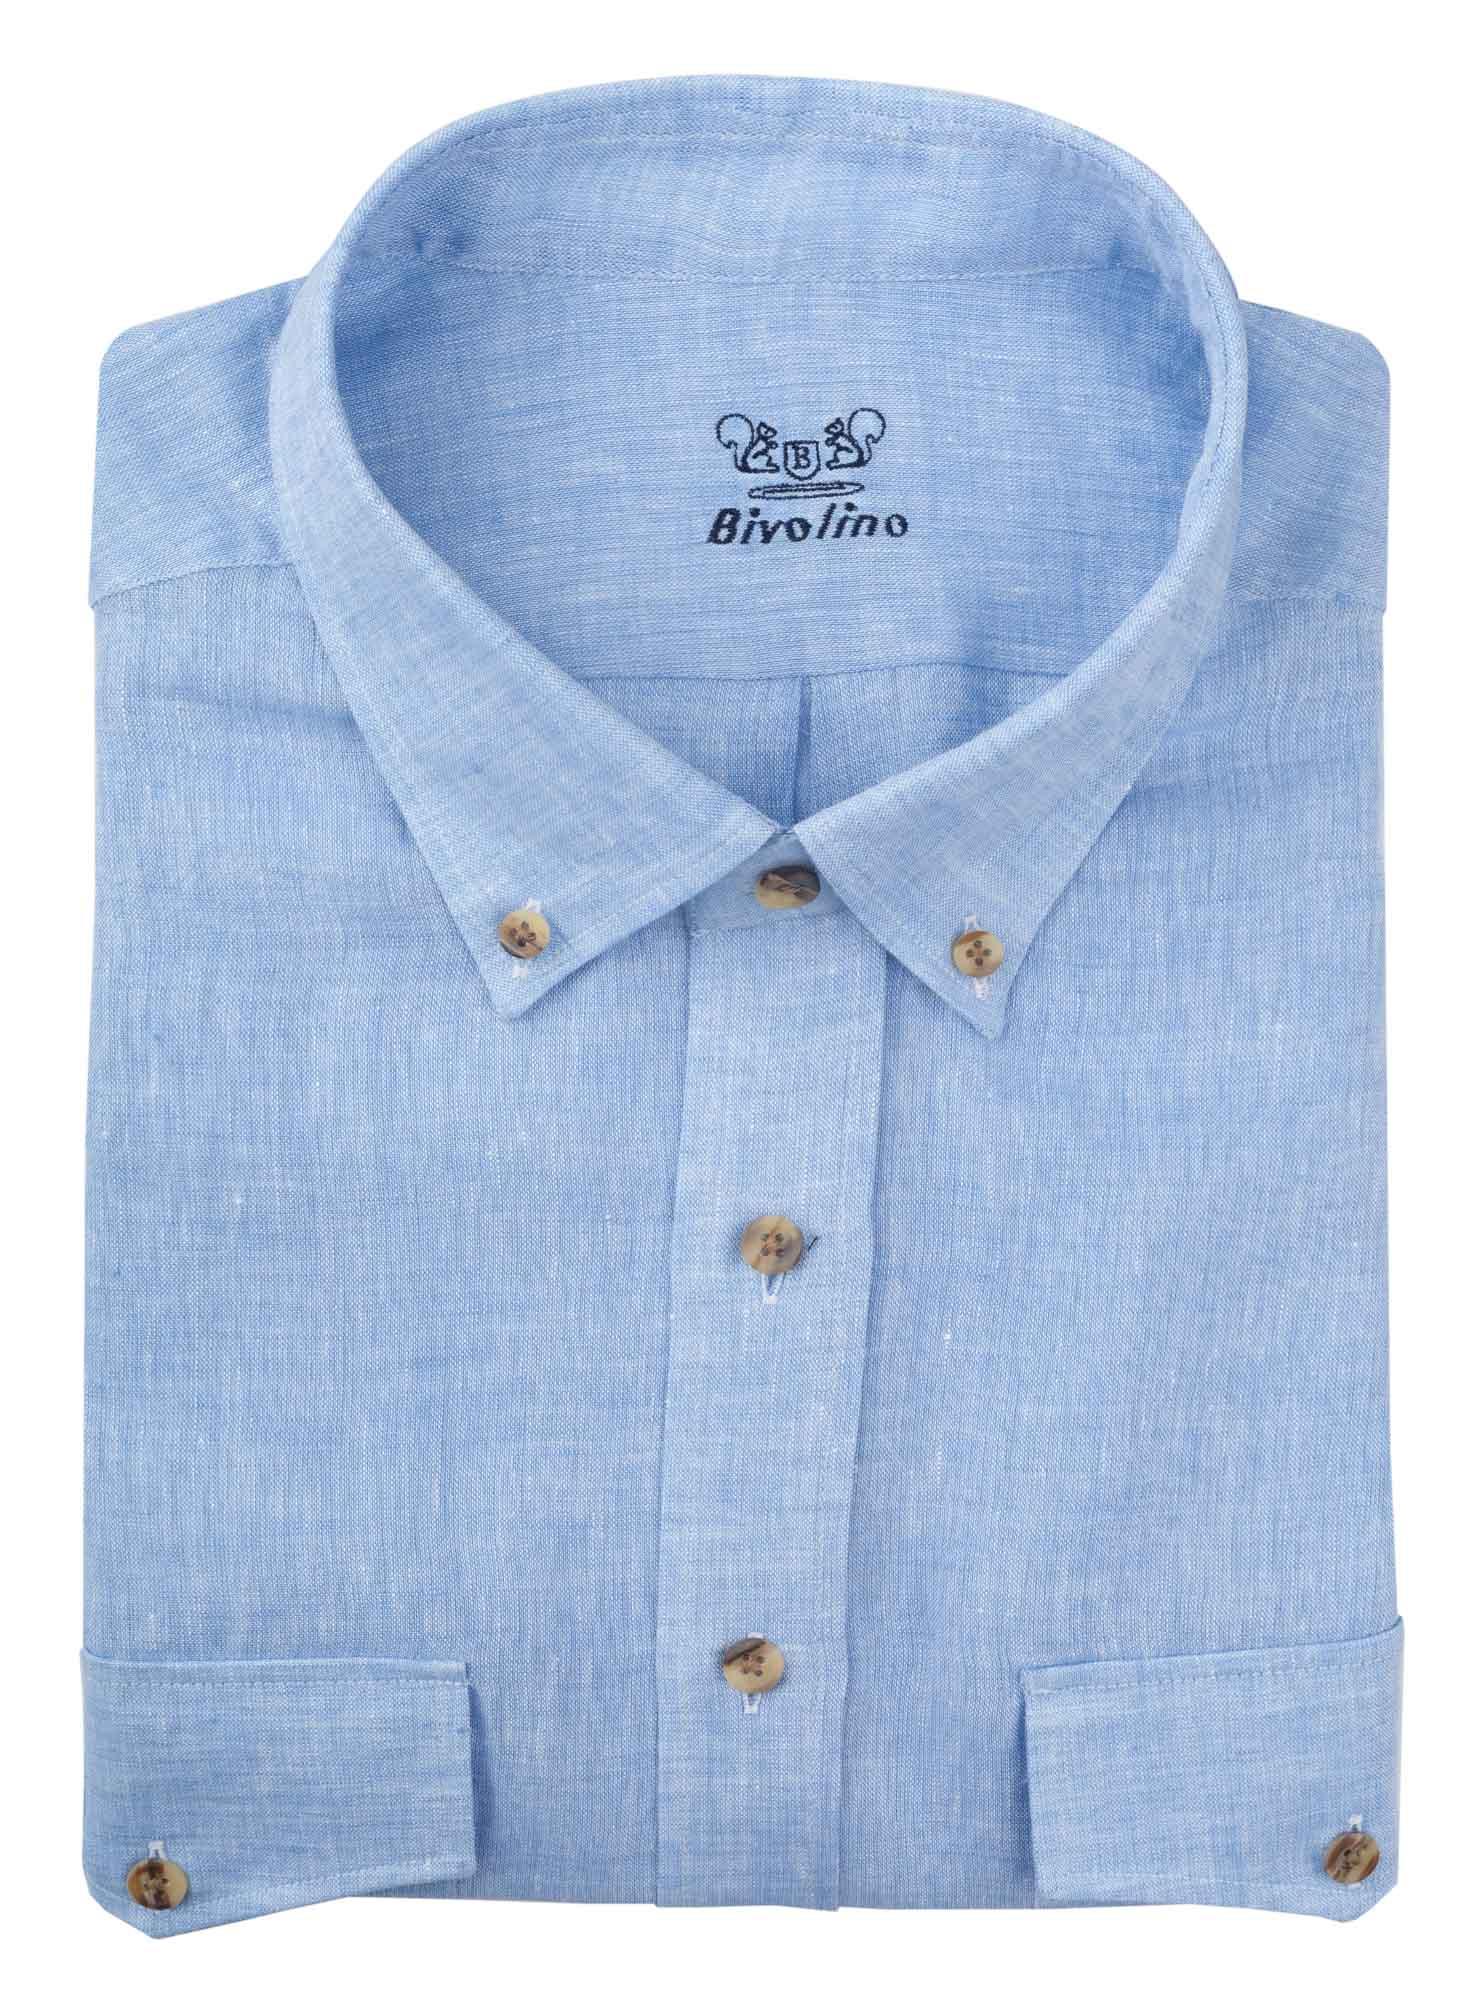 SORINI - Smart Casual blaues Leinen Hemd - Sera 2